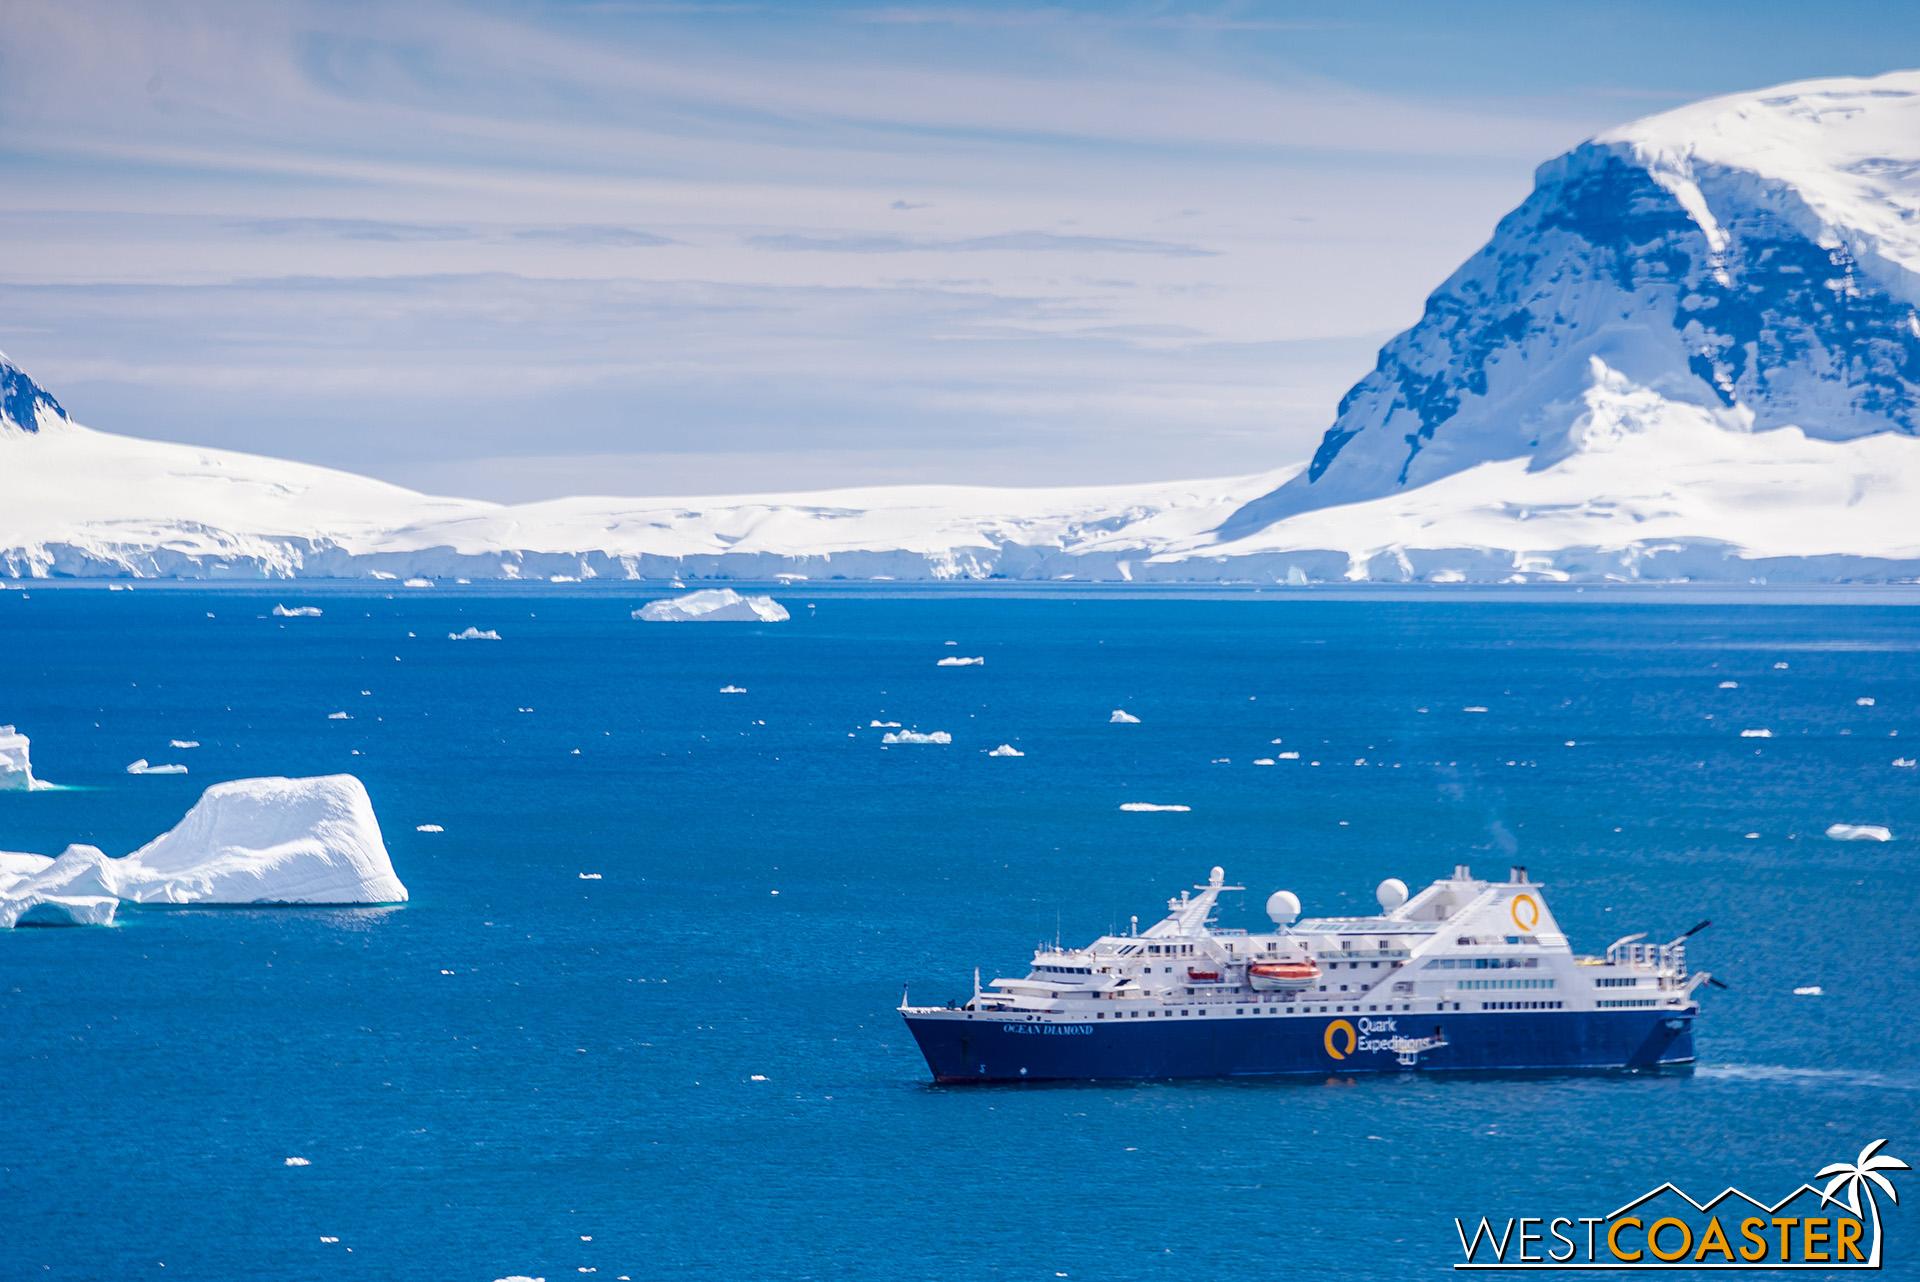 Antarctica-19_0318-B-OceanDiamond-0012.jpg